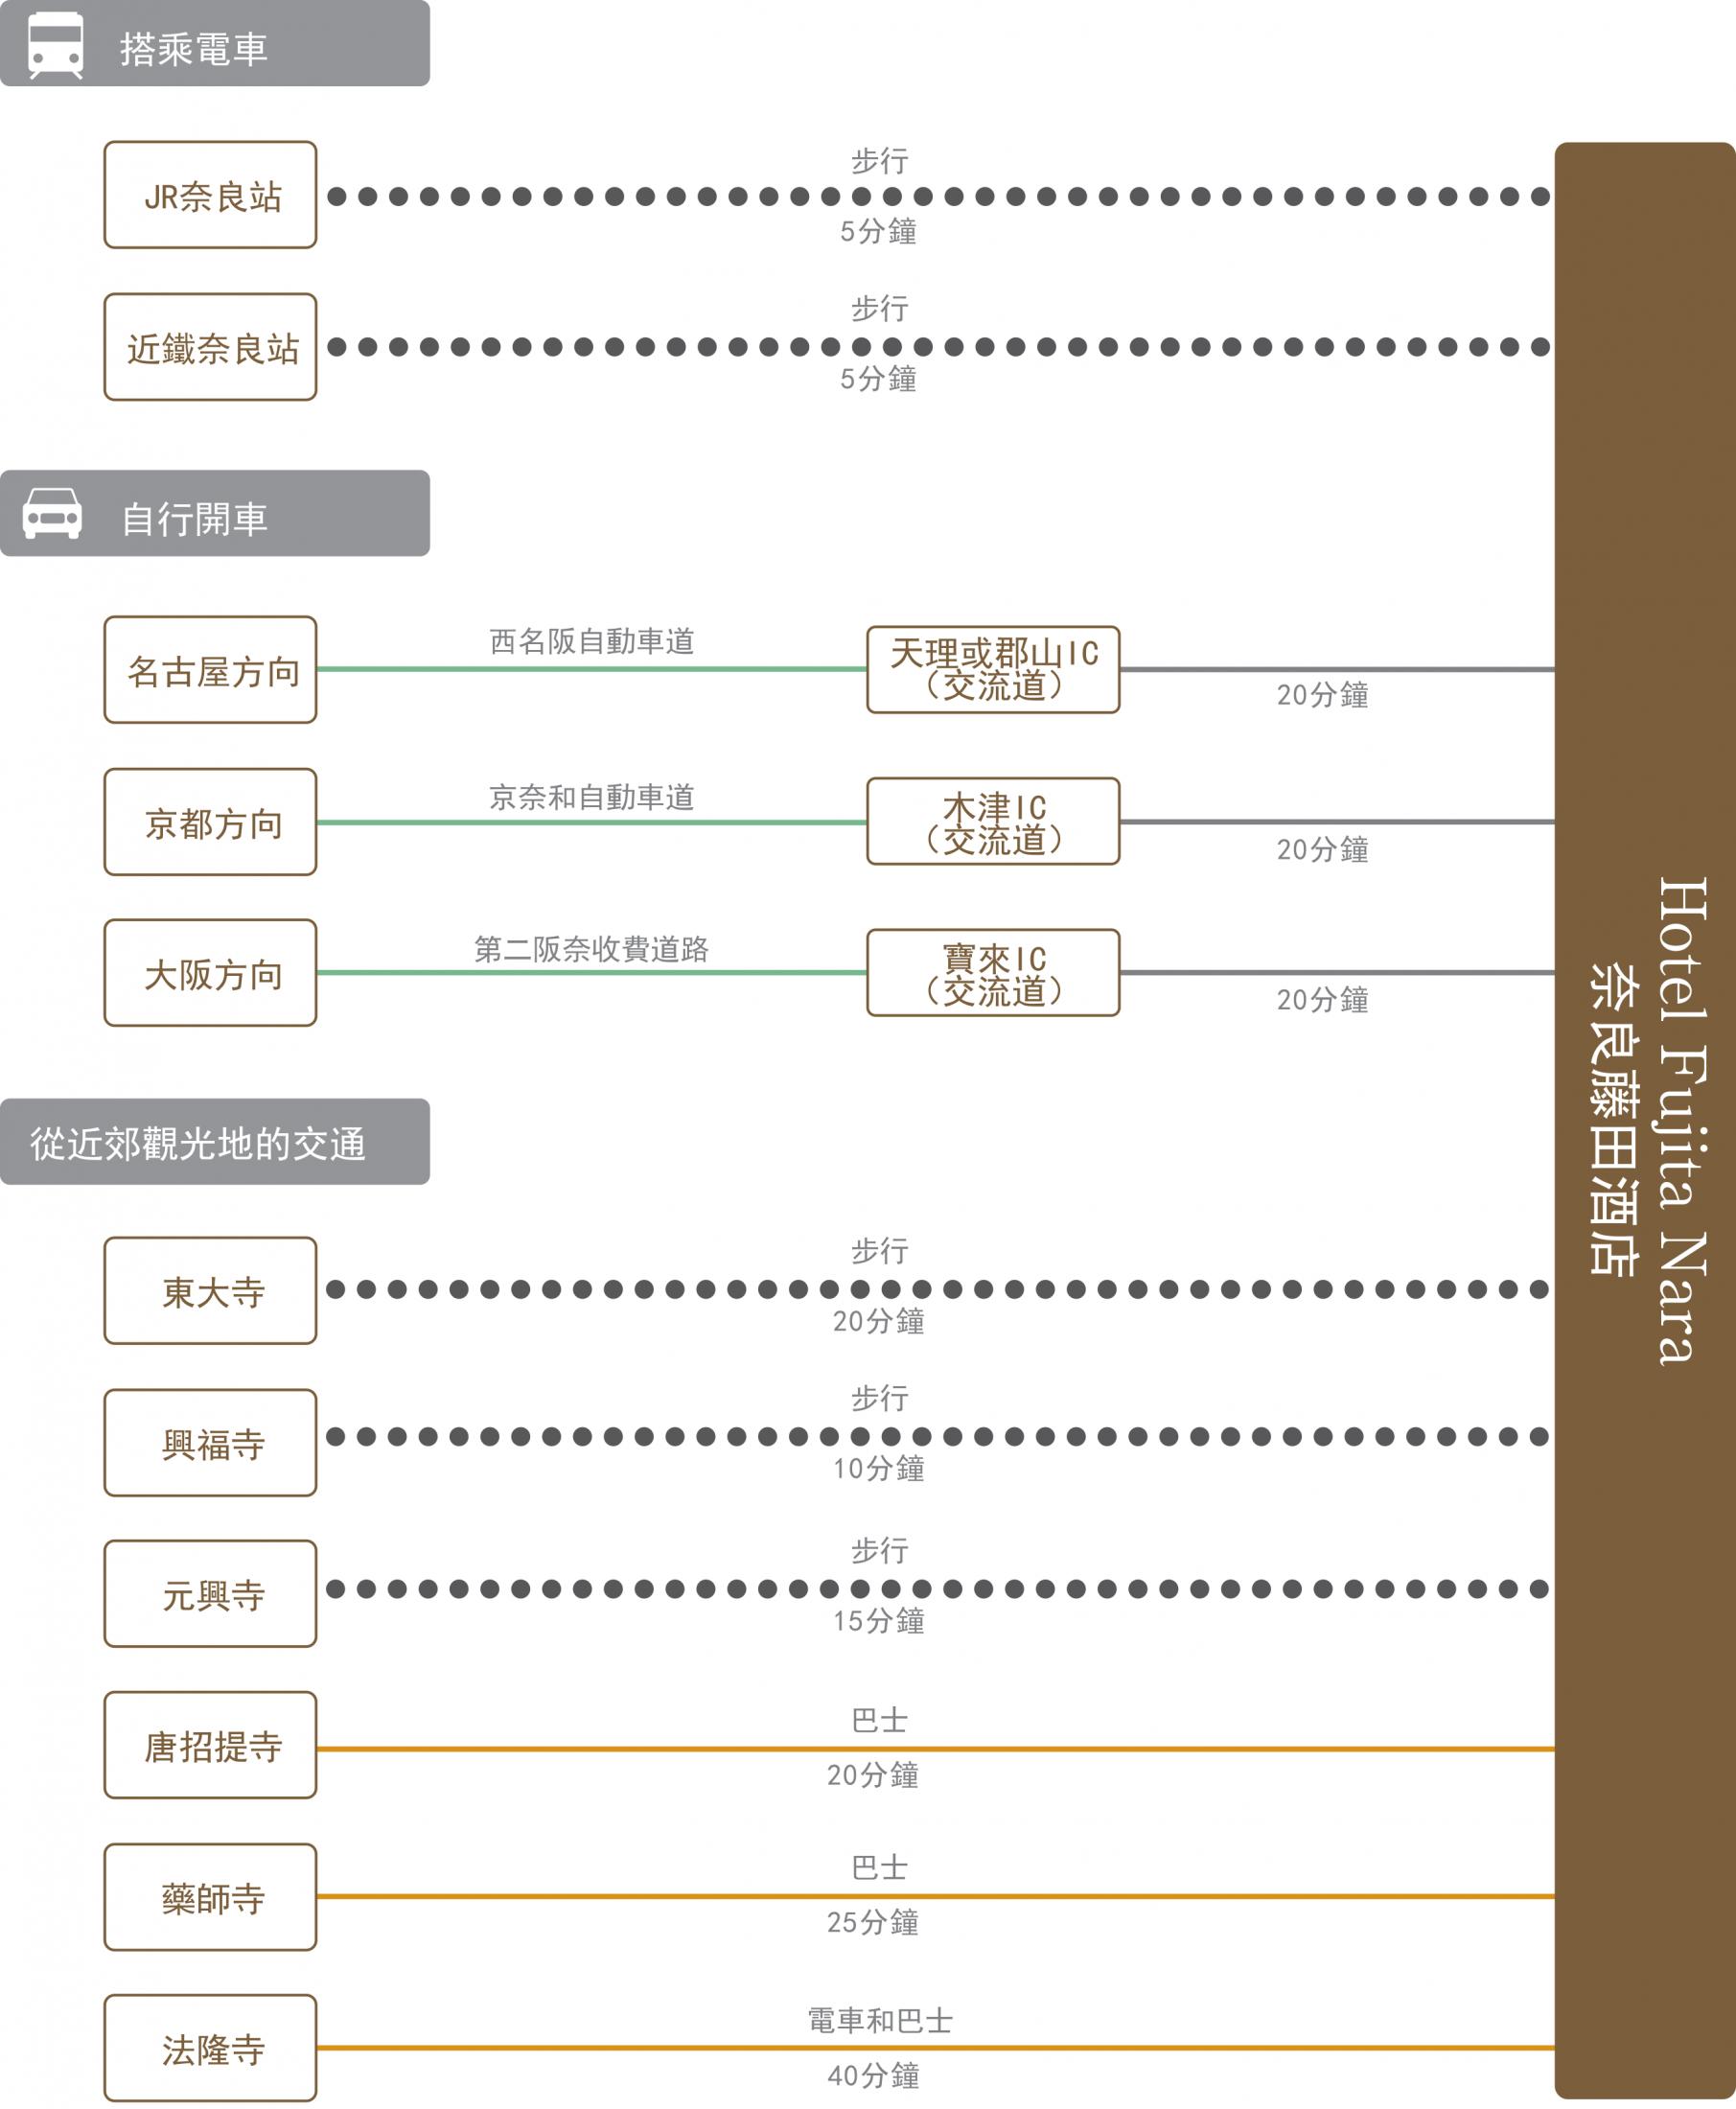 chart_zh-tw_nara_wh